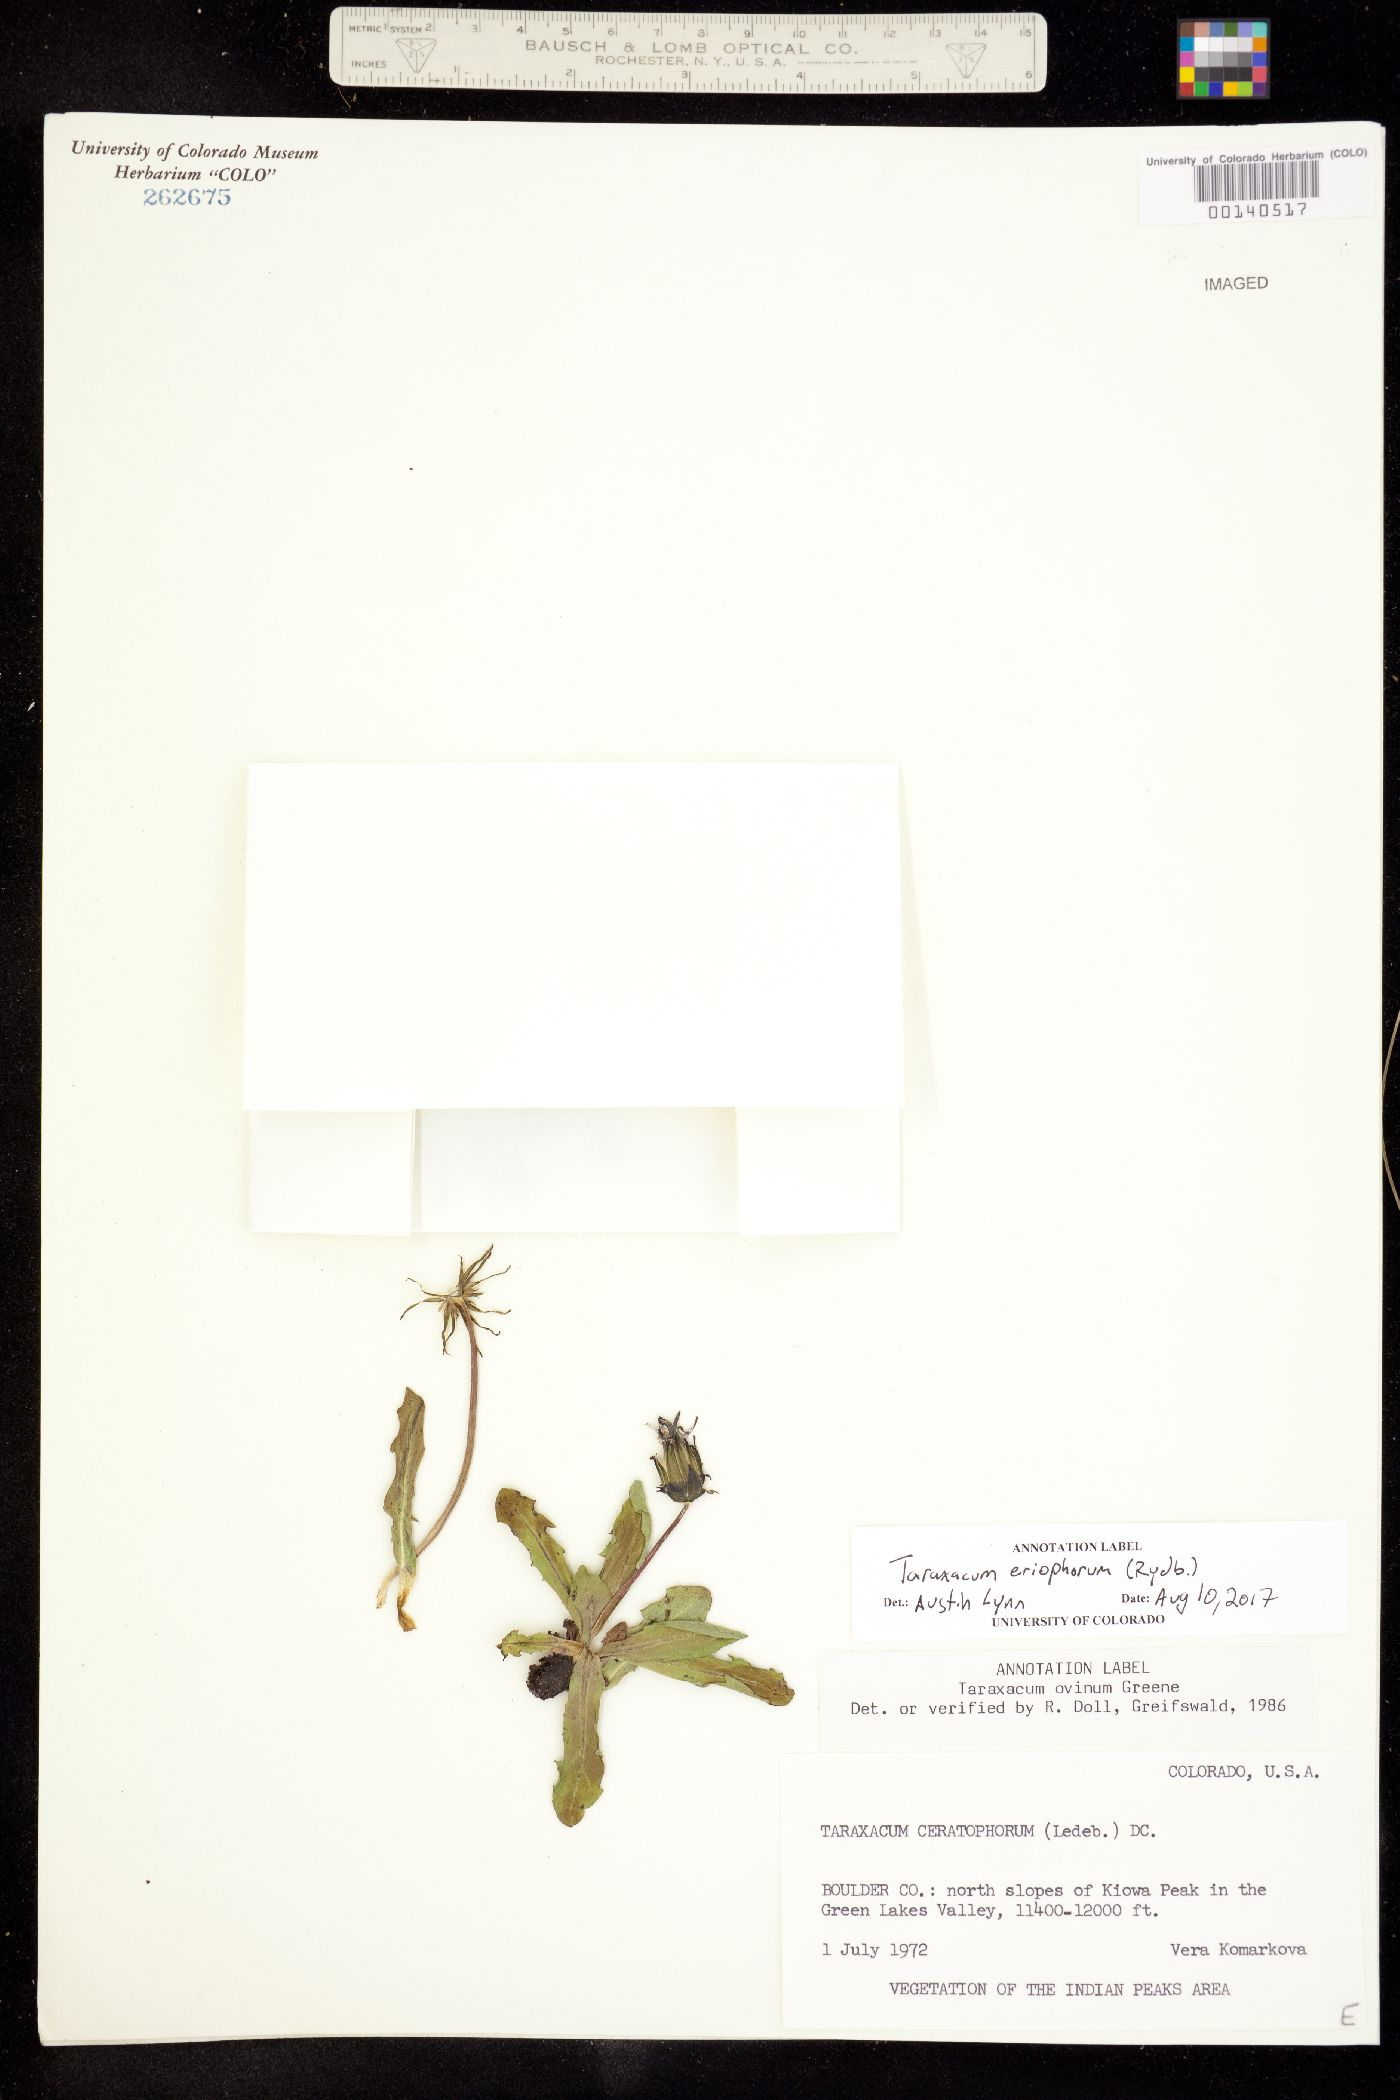 Taraxacum image